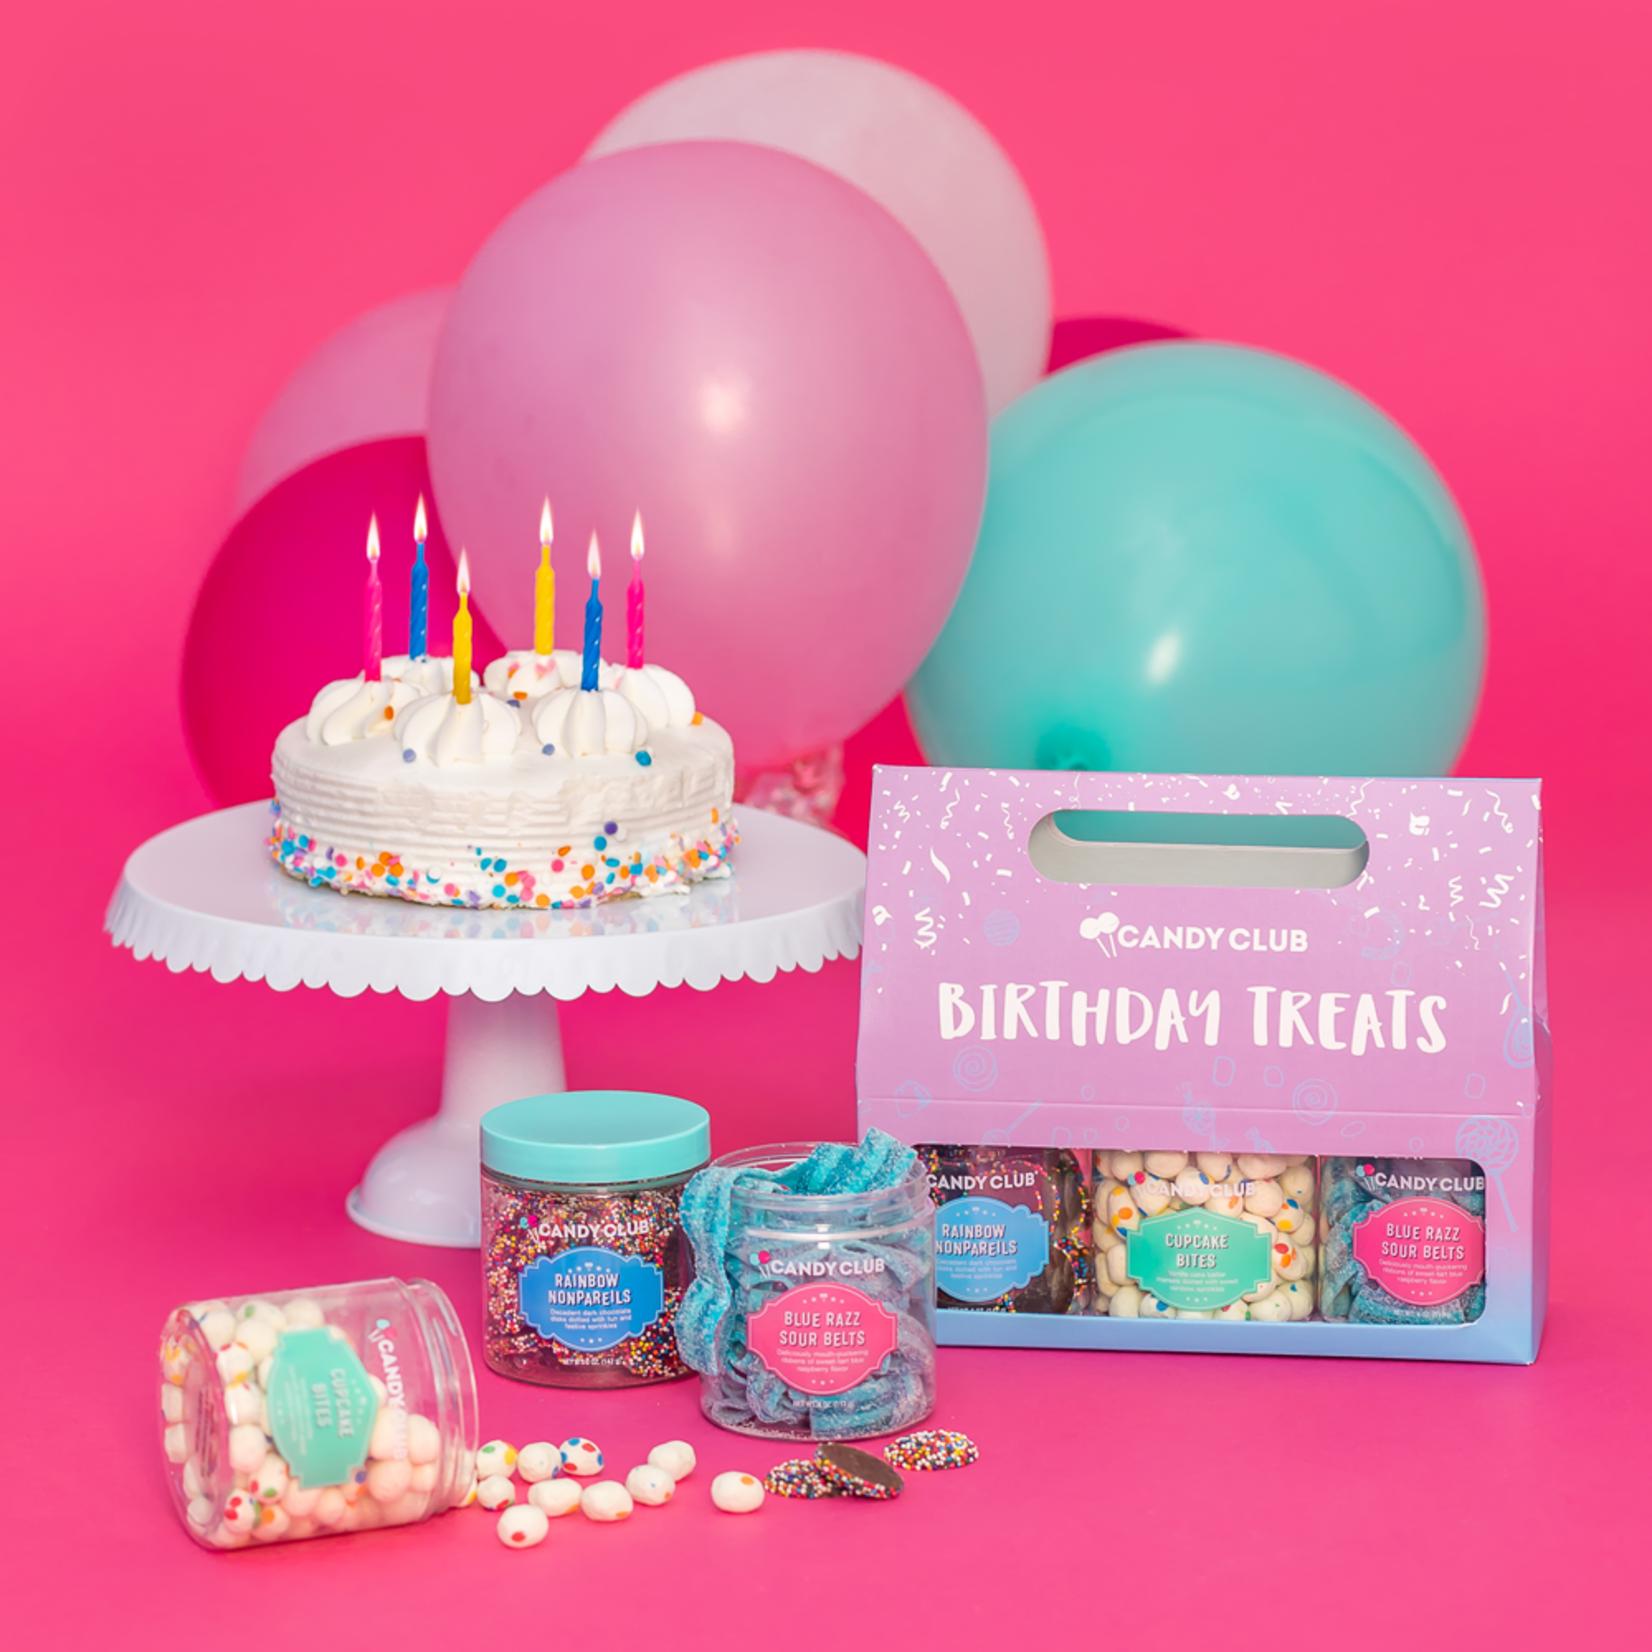 Candy Club Birthday Treats 'Sweet' Gift Set